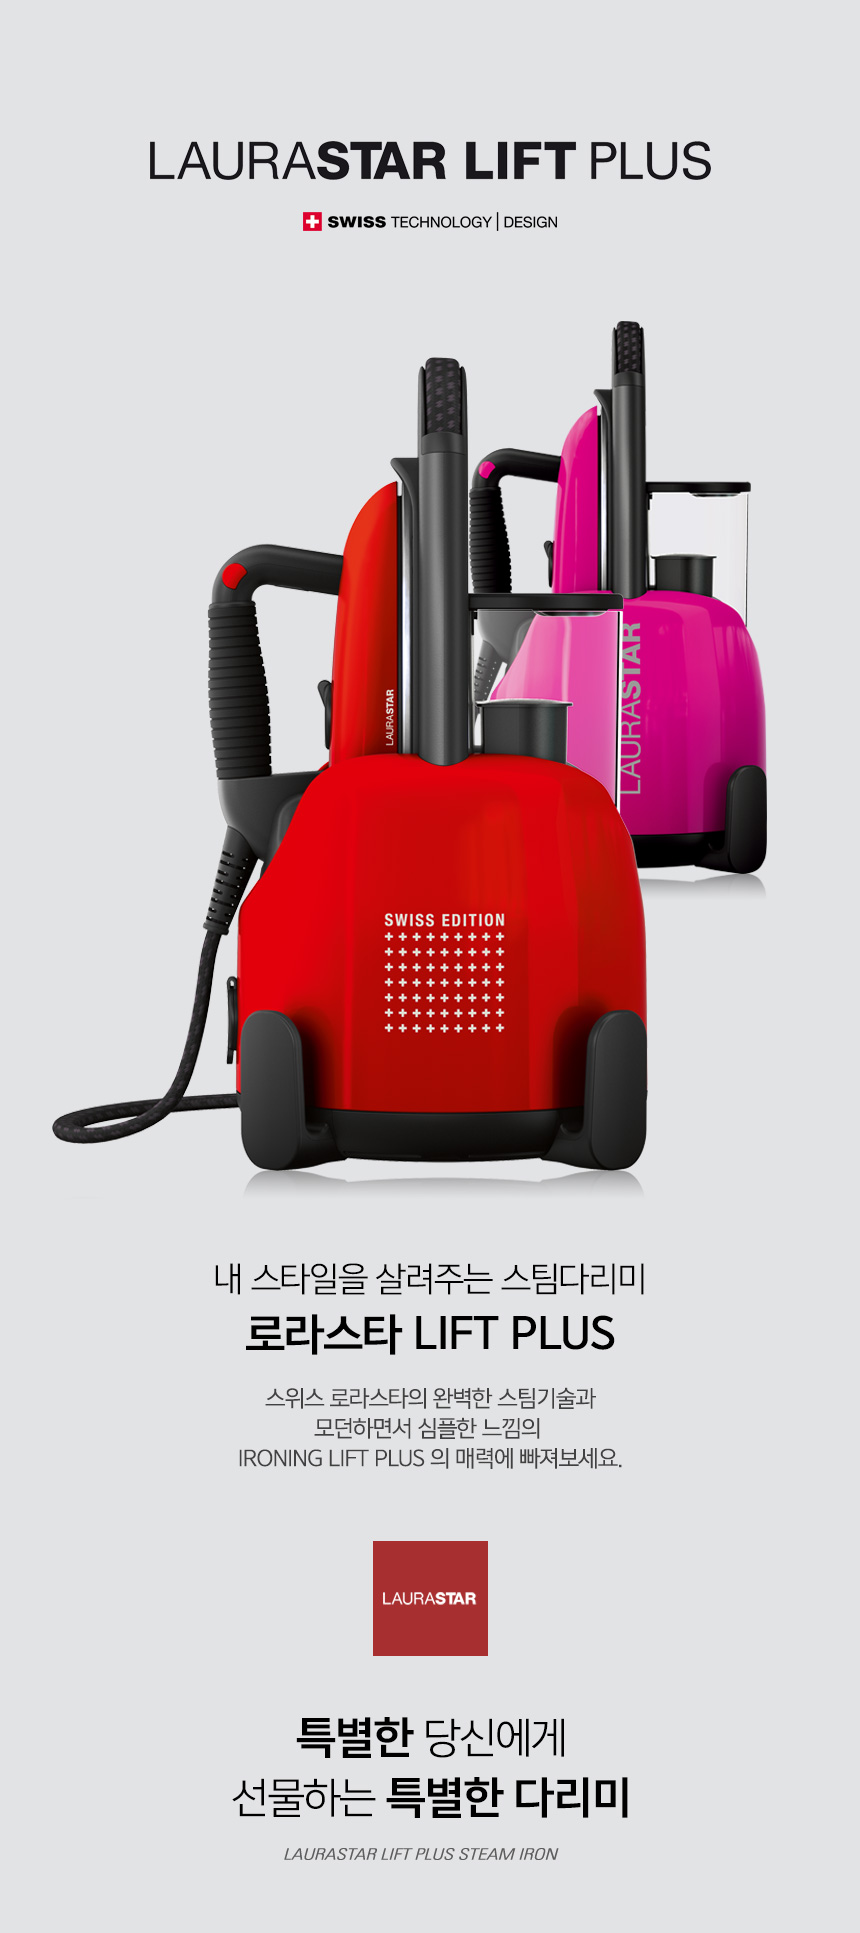 liftplus_02.jpg